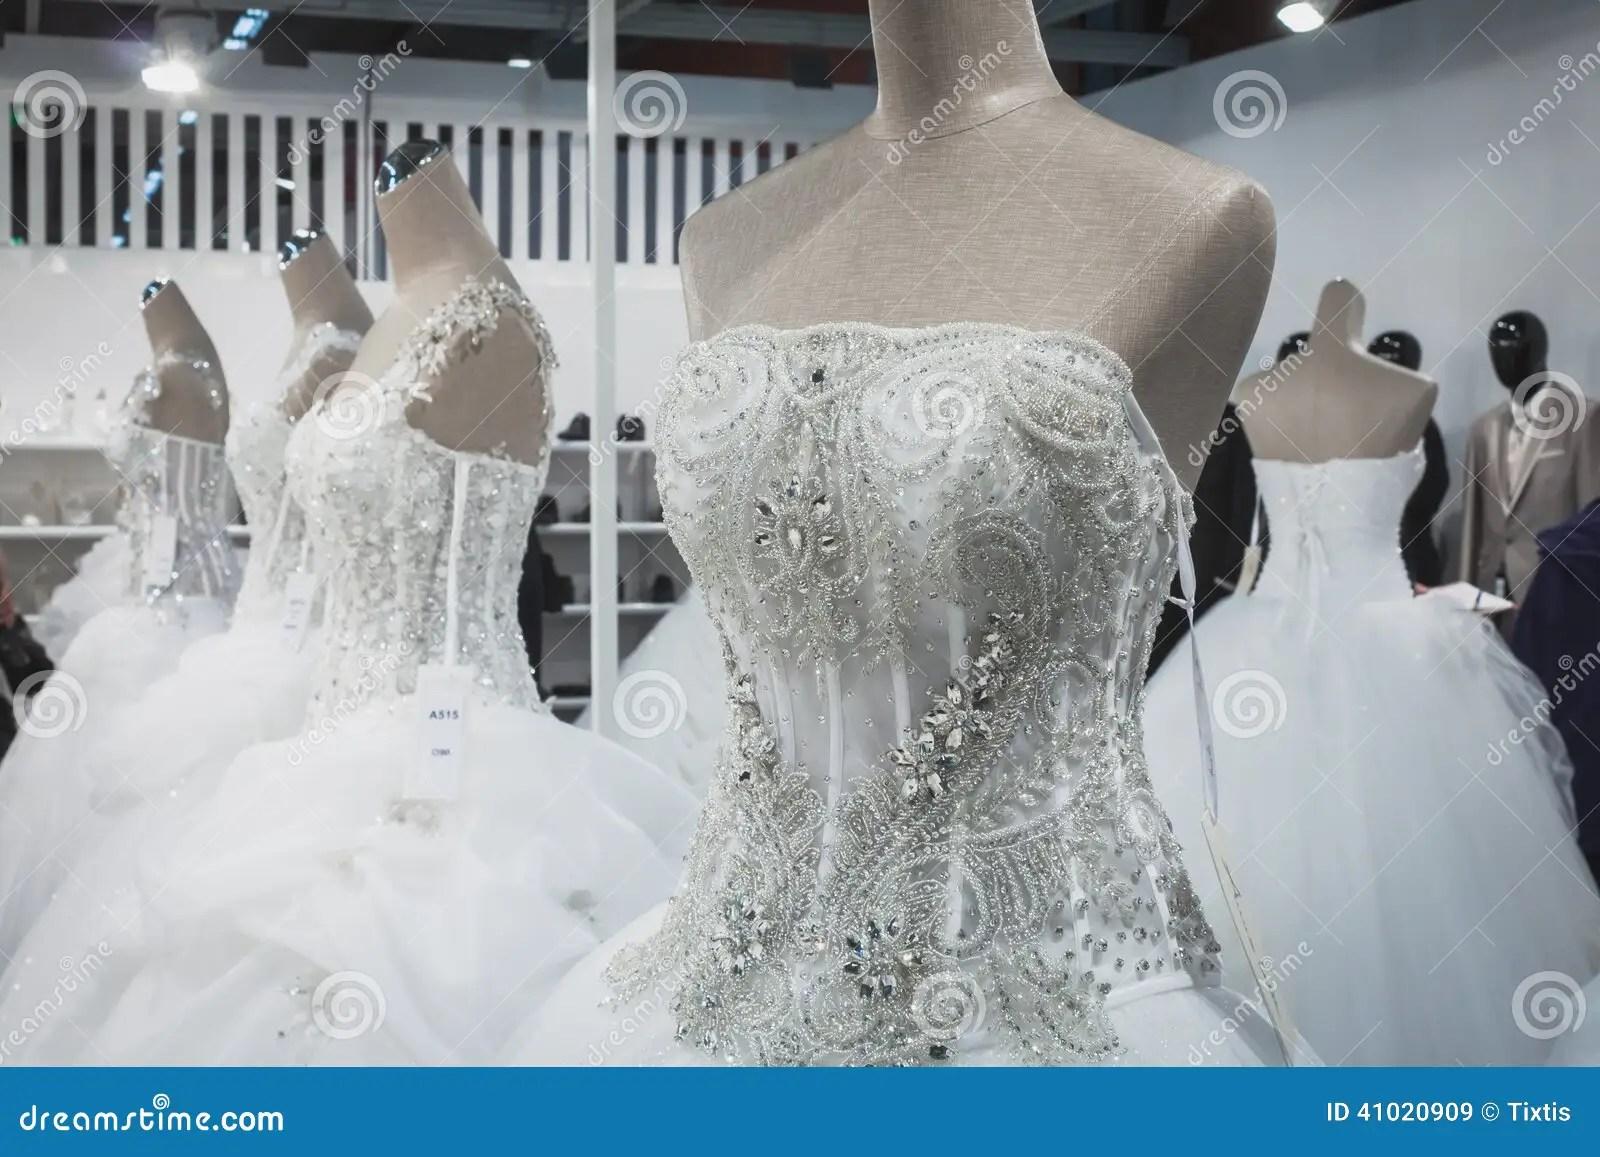 Wedding Dresses On Display At Si' Sposaitalia In Milan